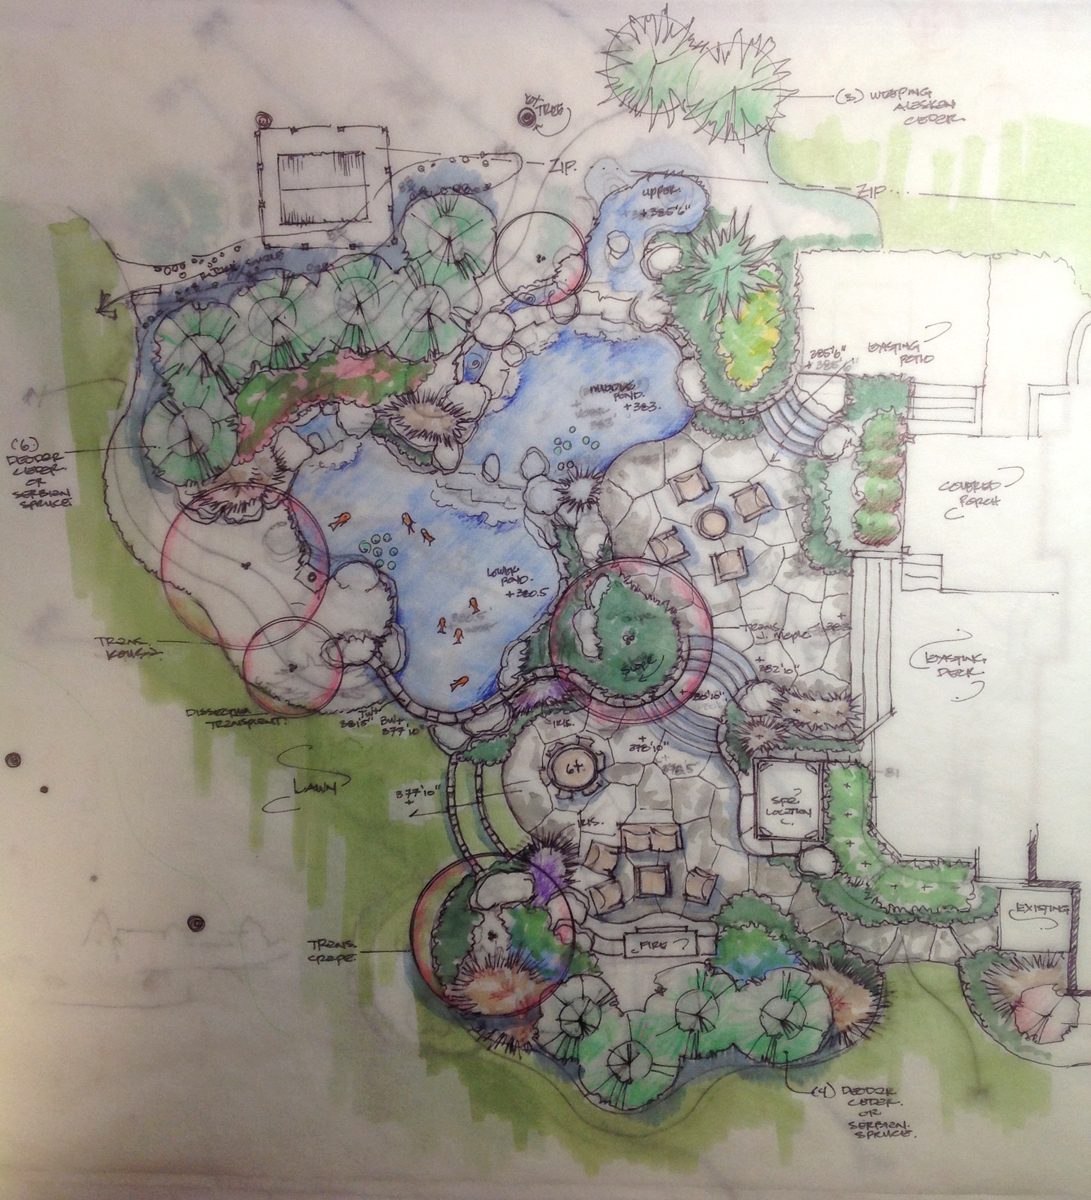 Waterfall koi pond design in vienna virginia for Koi pond design plans